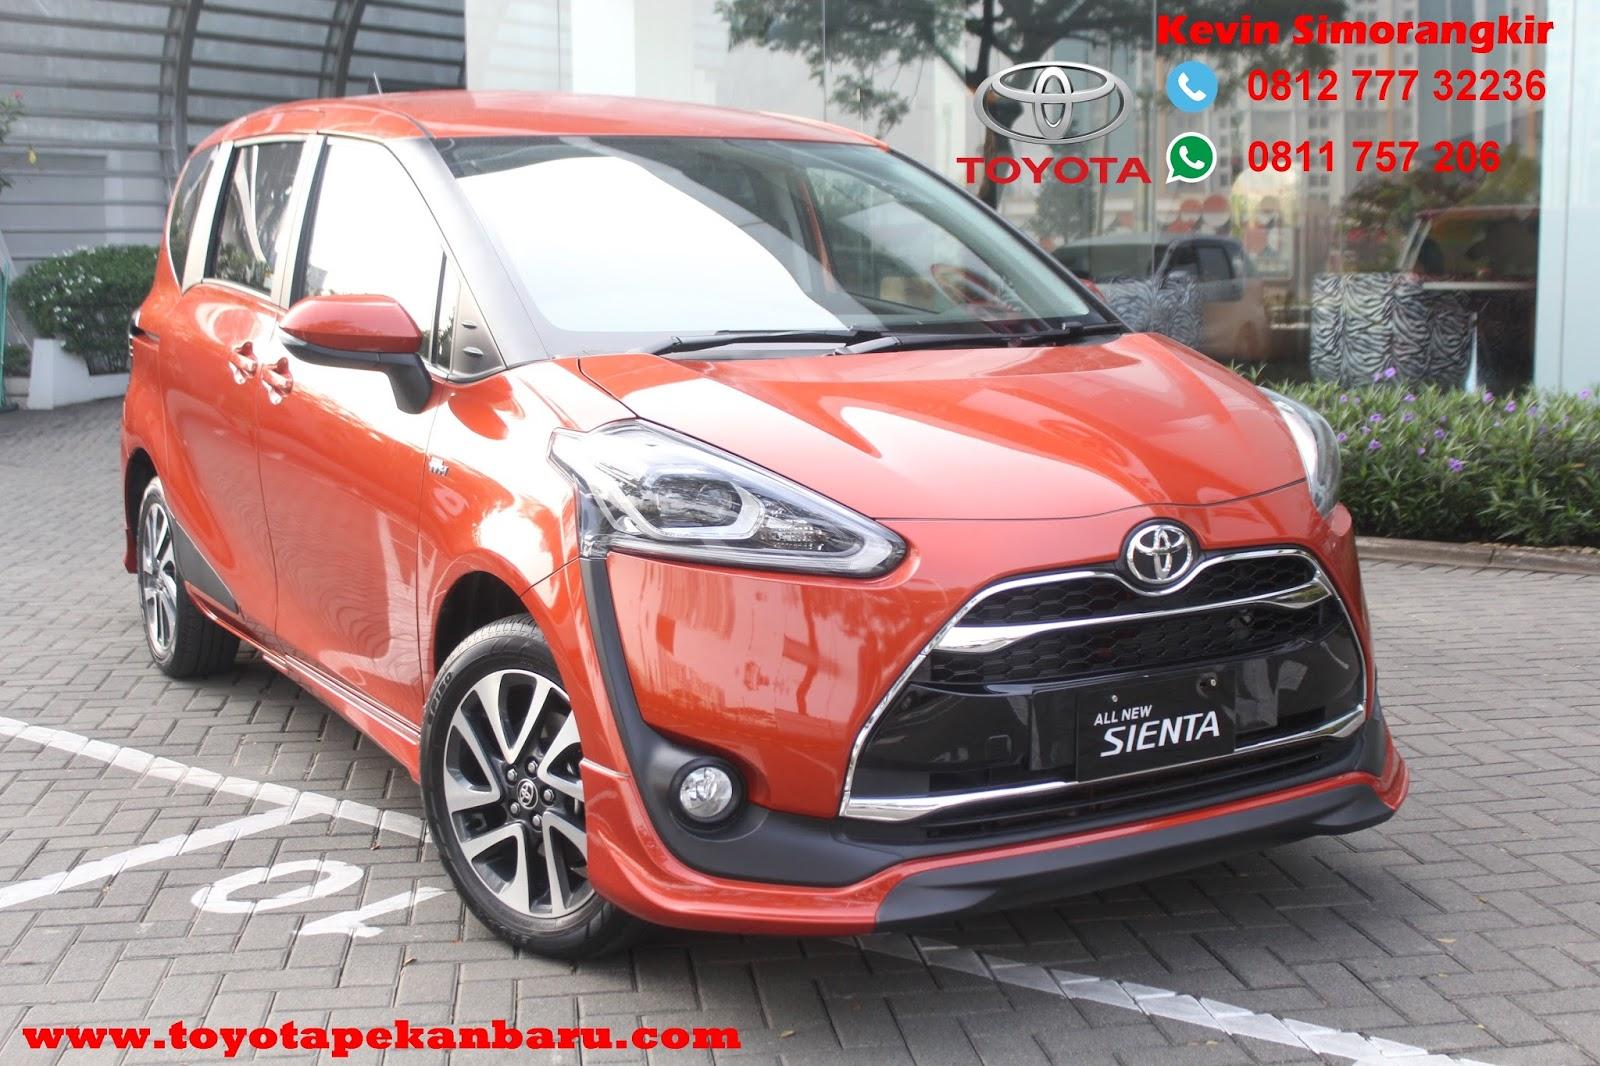 grand new avanza veloz 1.5 2017 modifikasi all yaris trd sportivo harga sienta pekanbaru riau toyota